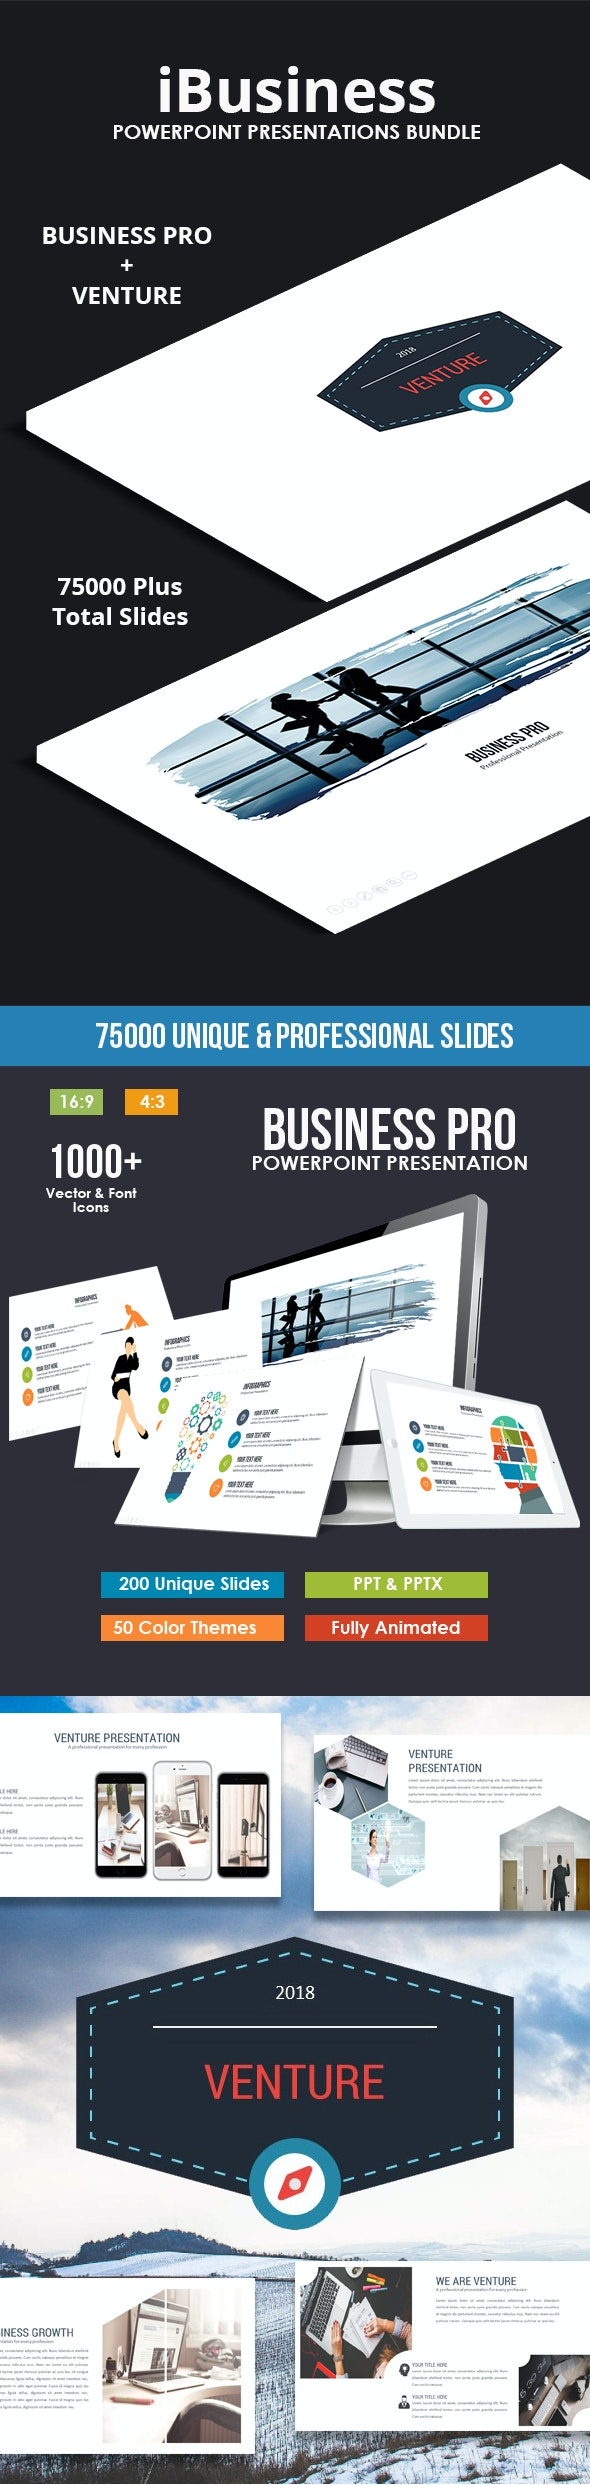 iBusiness 2018 Powerpoint Bundle - Business PowerPoint Templates